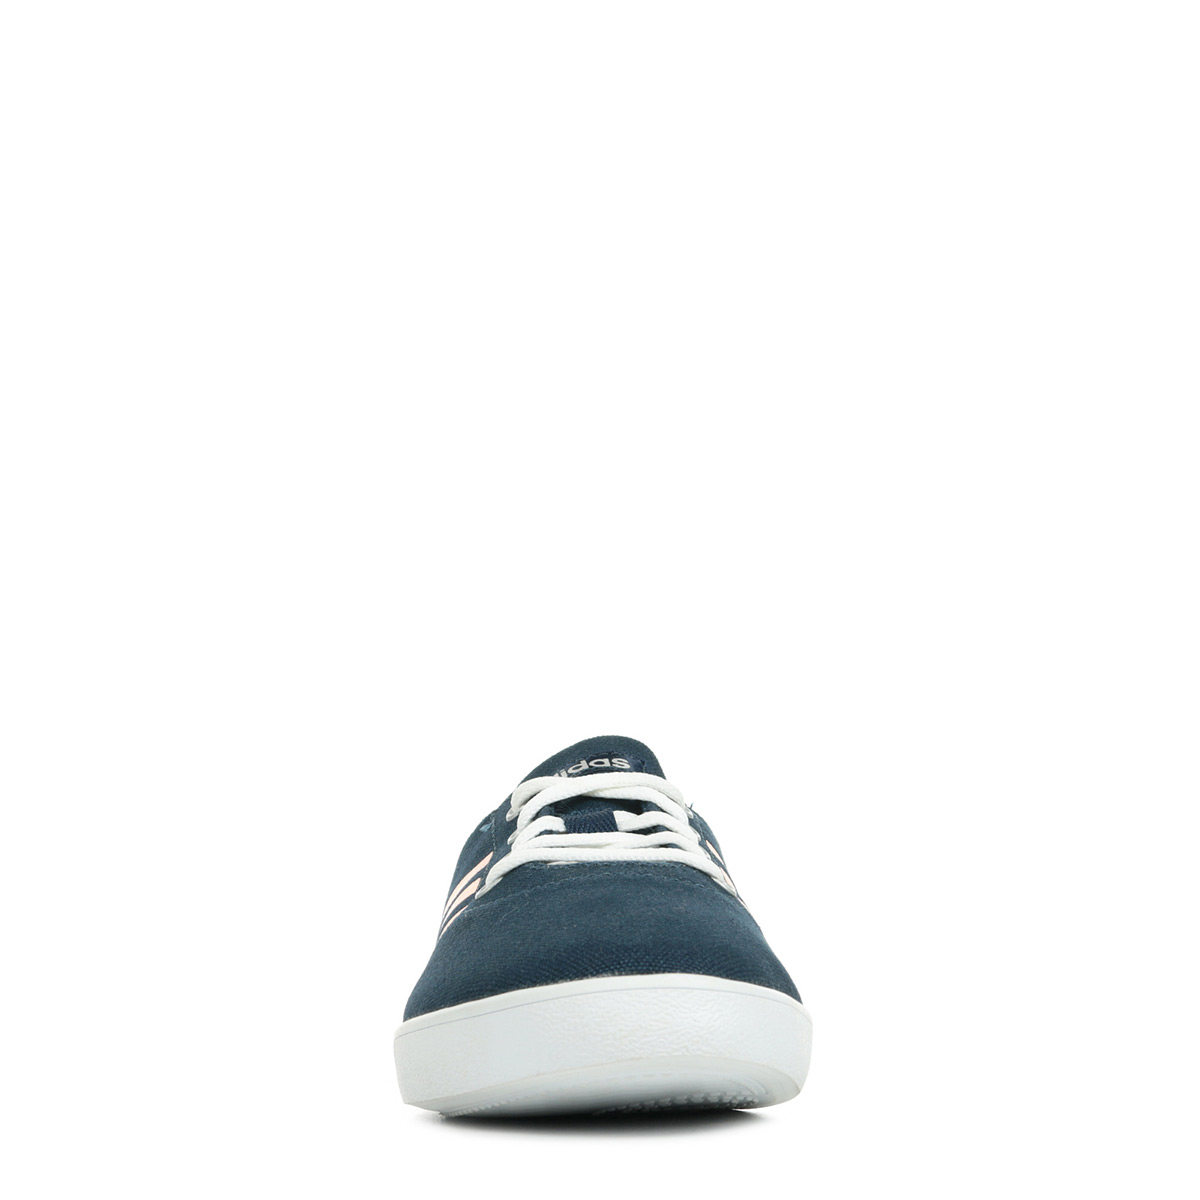 Marine Femme Vulc Bleu Baskets Qt Vs Chaussures Neo Adidas W Taille tCxhQdsrBo